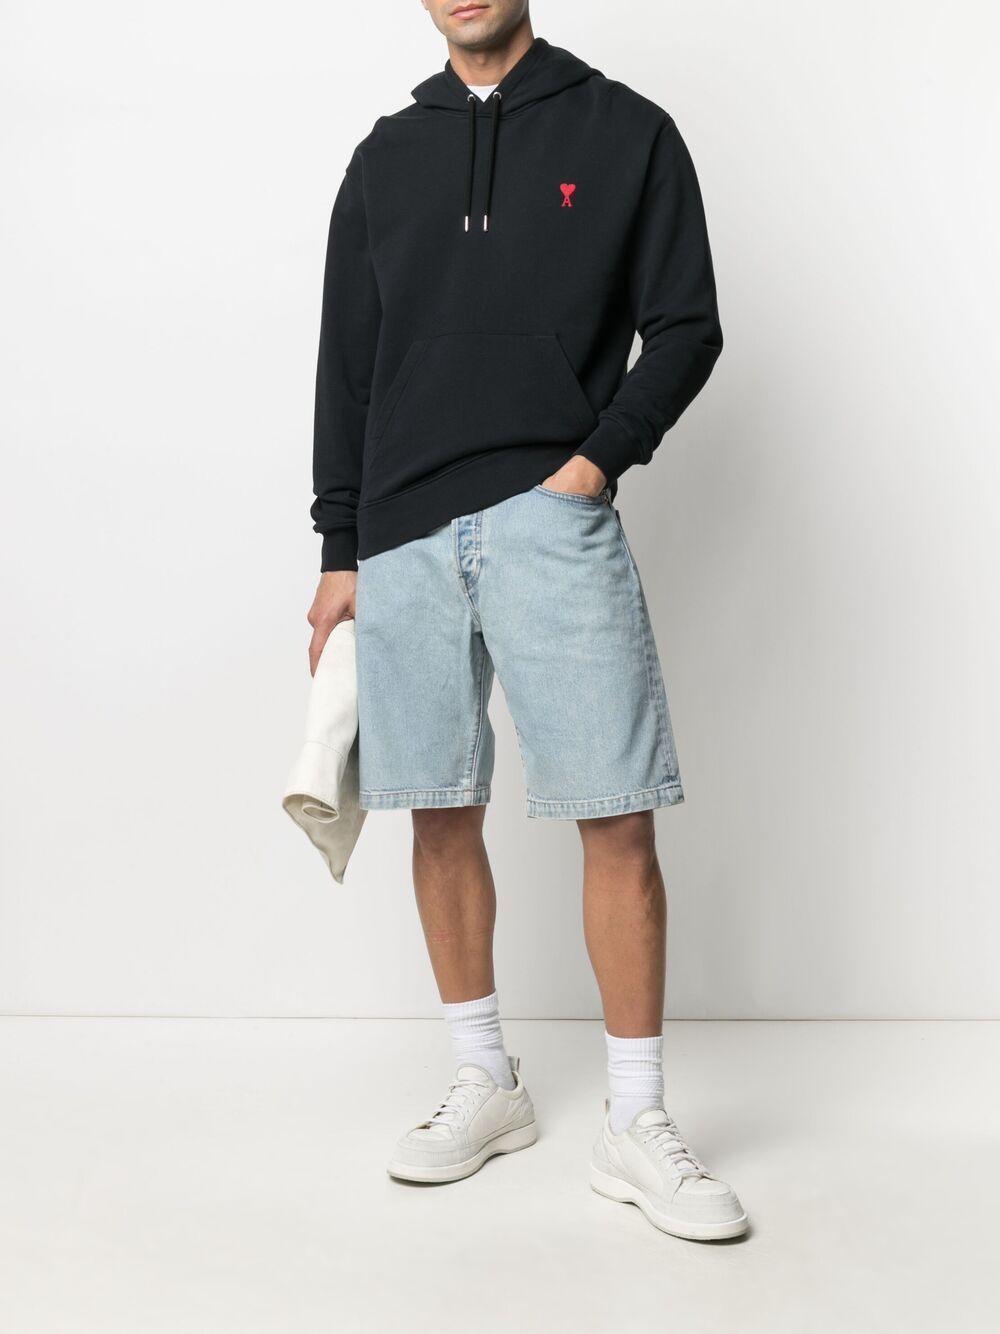 Ami de coeur hoodie Black in Cotton Man AMI - ALEXANDRE MATTIUSSI | Sweatshirts | BFHJ008.730001